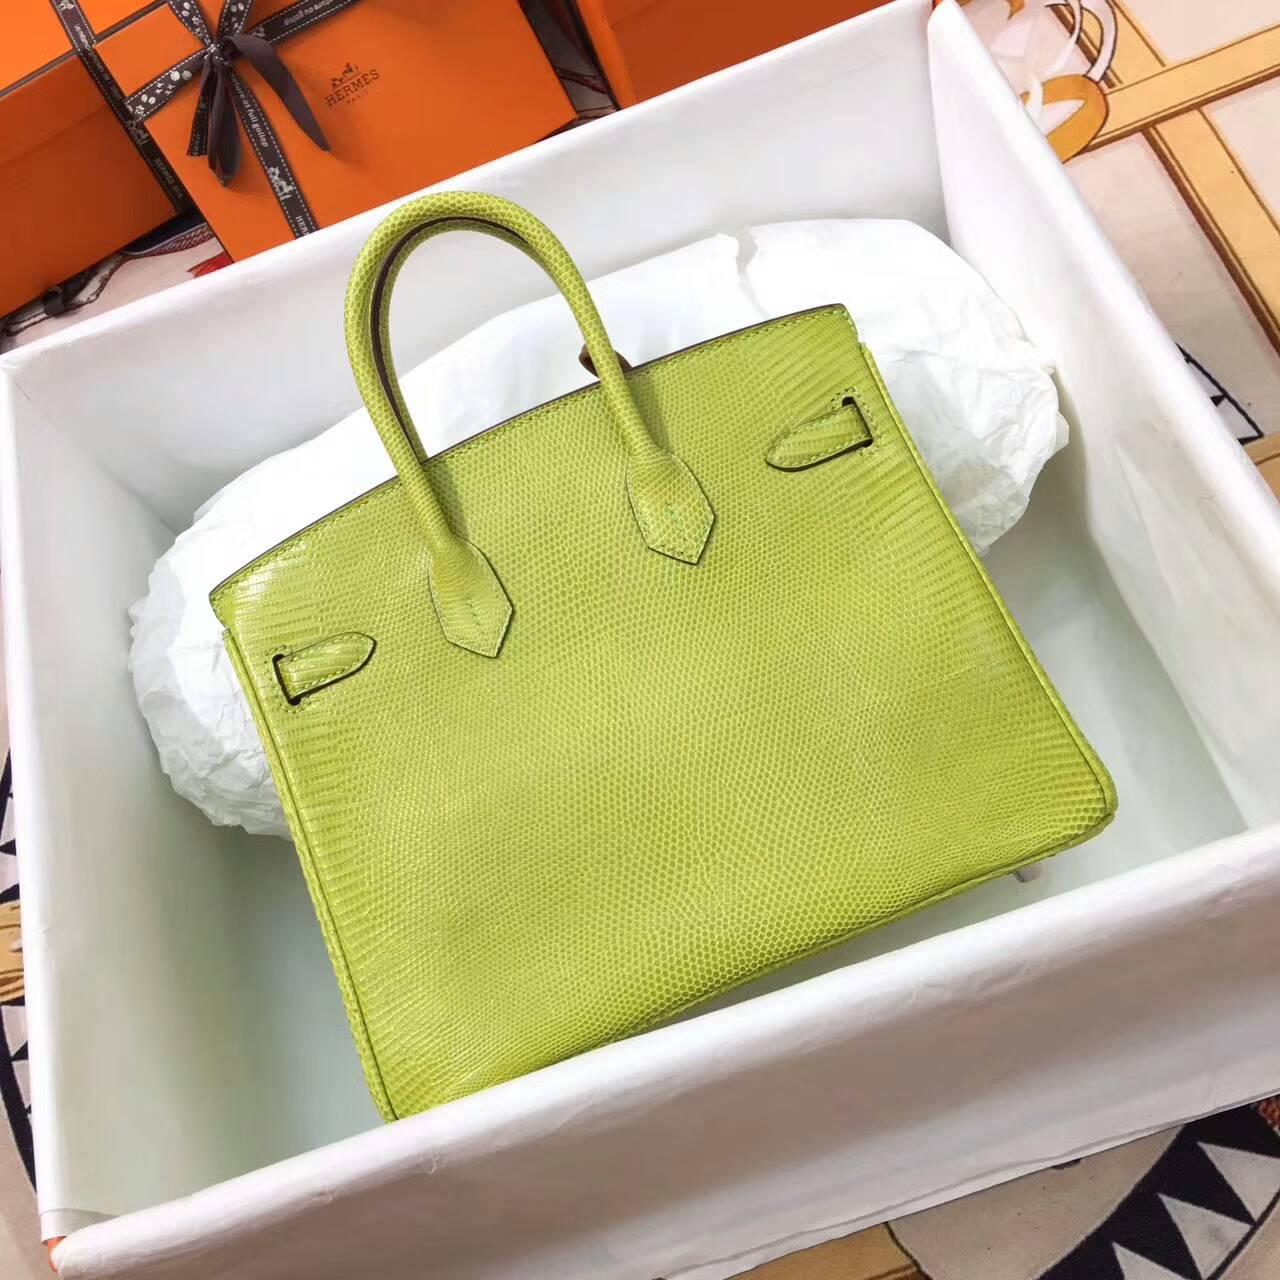 Birkin铂金包 Hermes包包 25cm Lizard 东南亚原产蜥蜴皮 6R Kiwi 奇异果绿 糖果绿 银扣